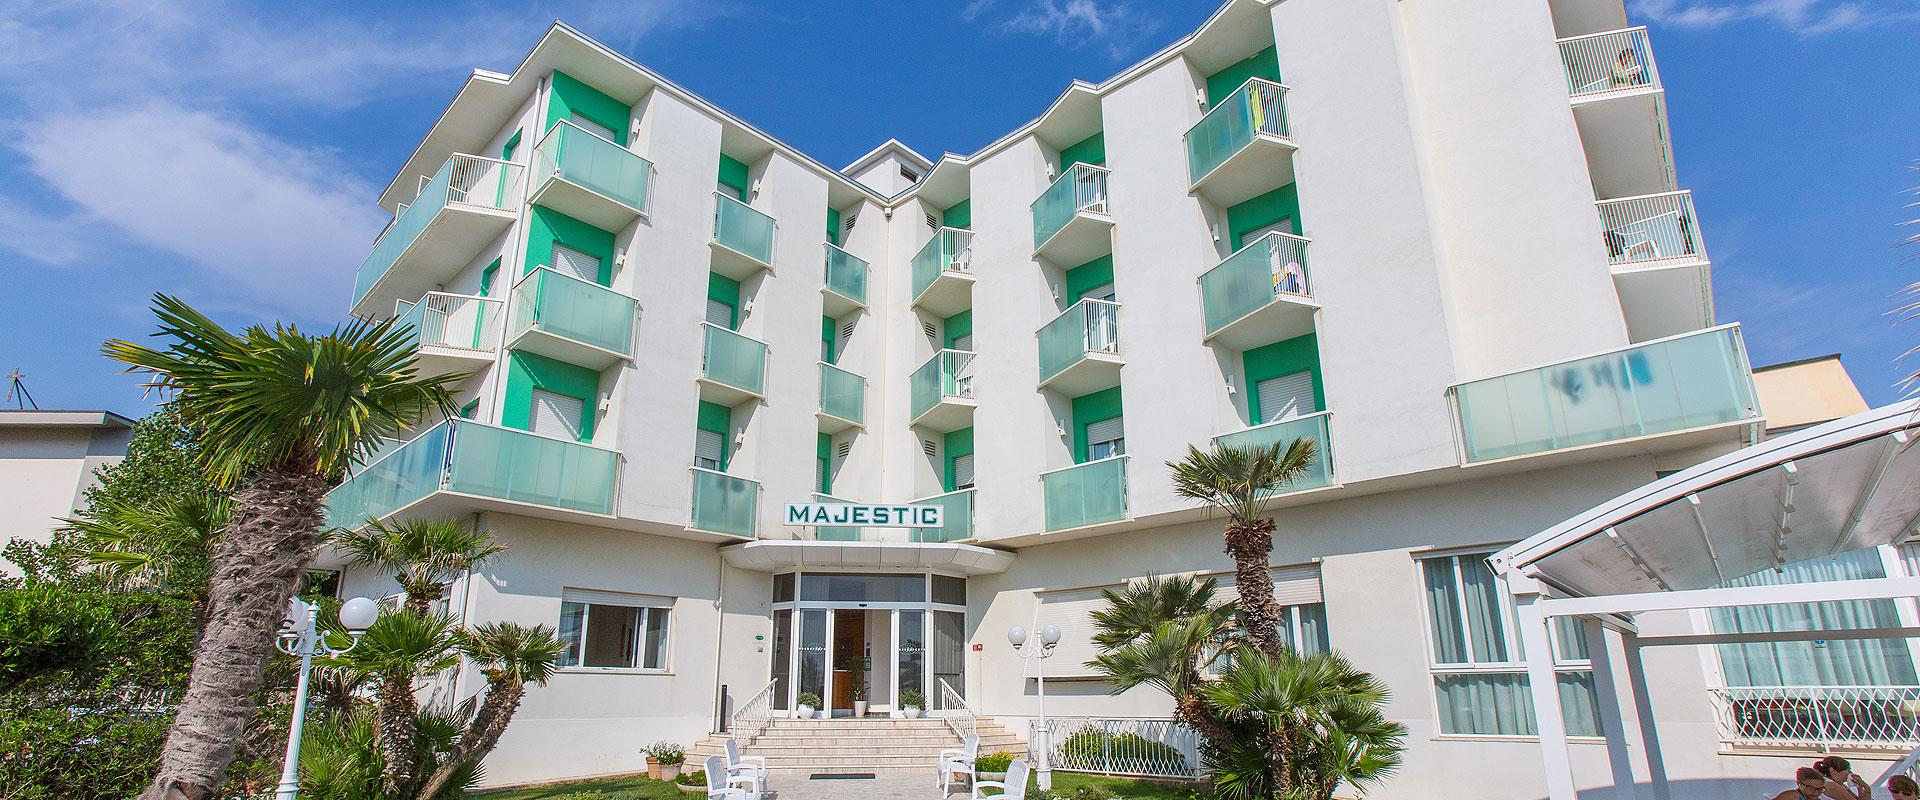 Hotel Senigallia  Stelle Pensione Completa